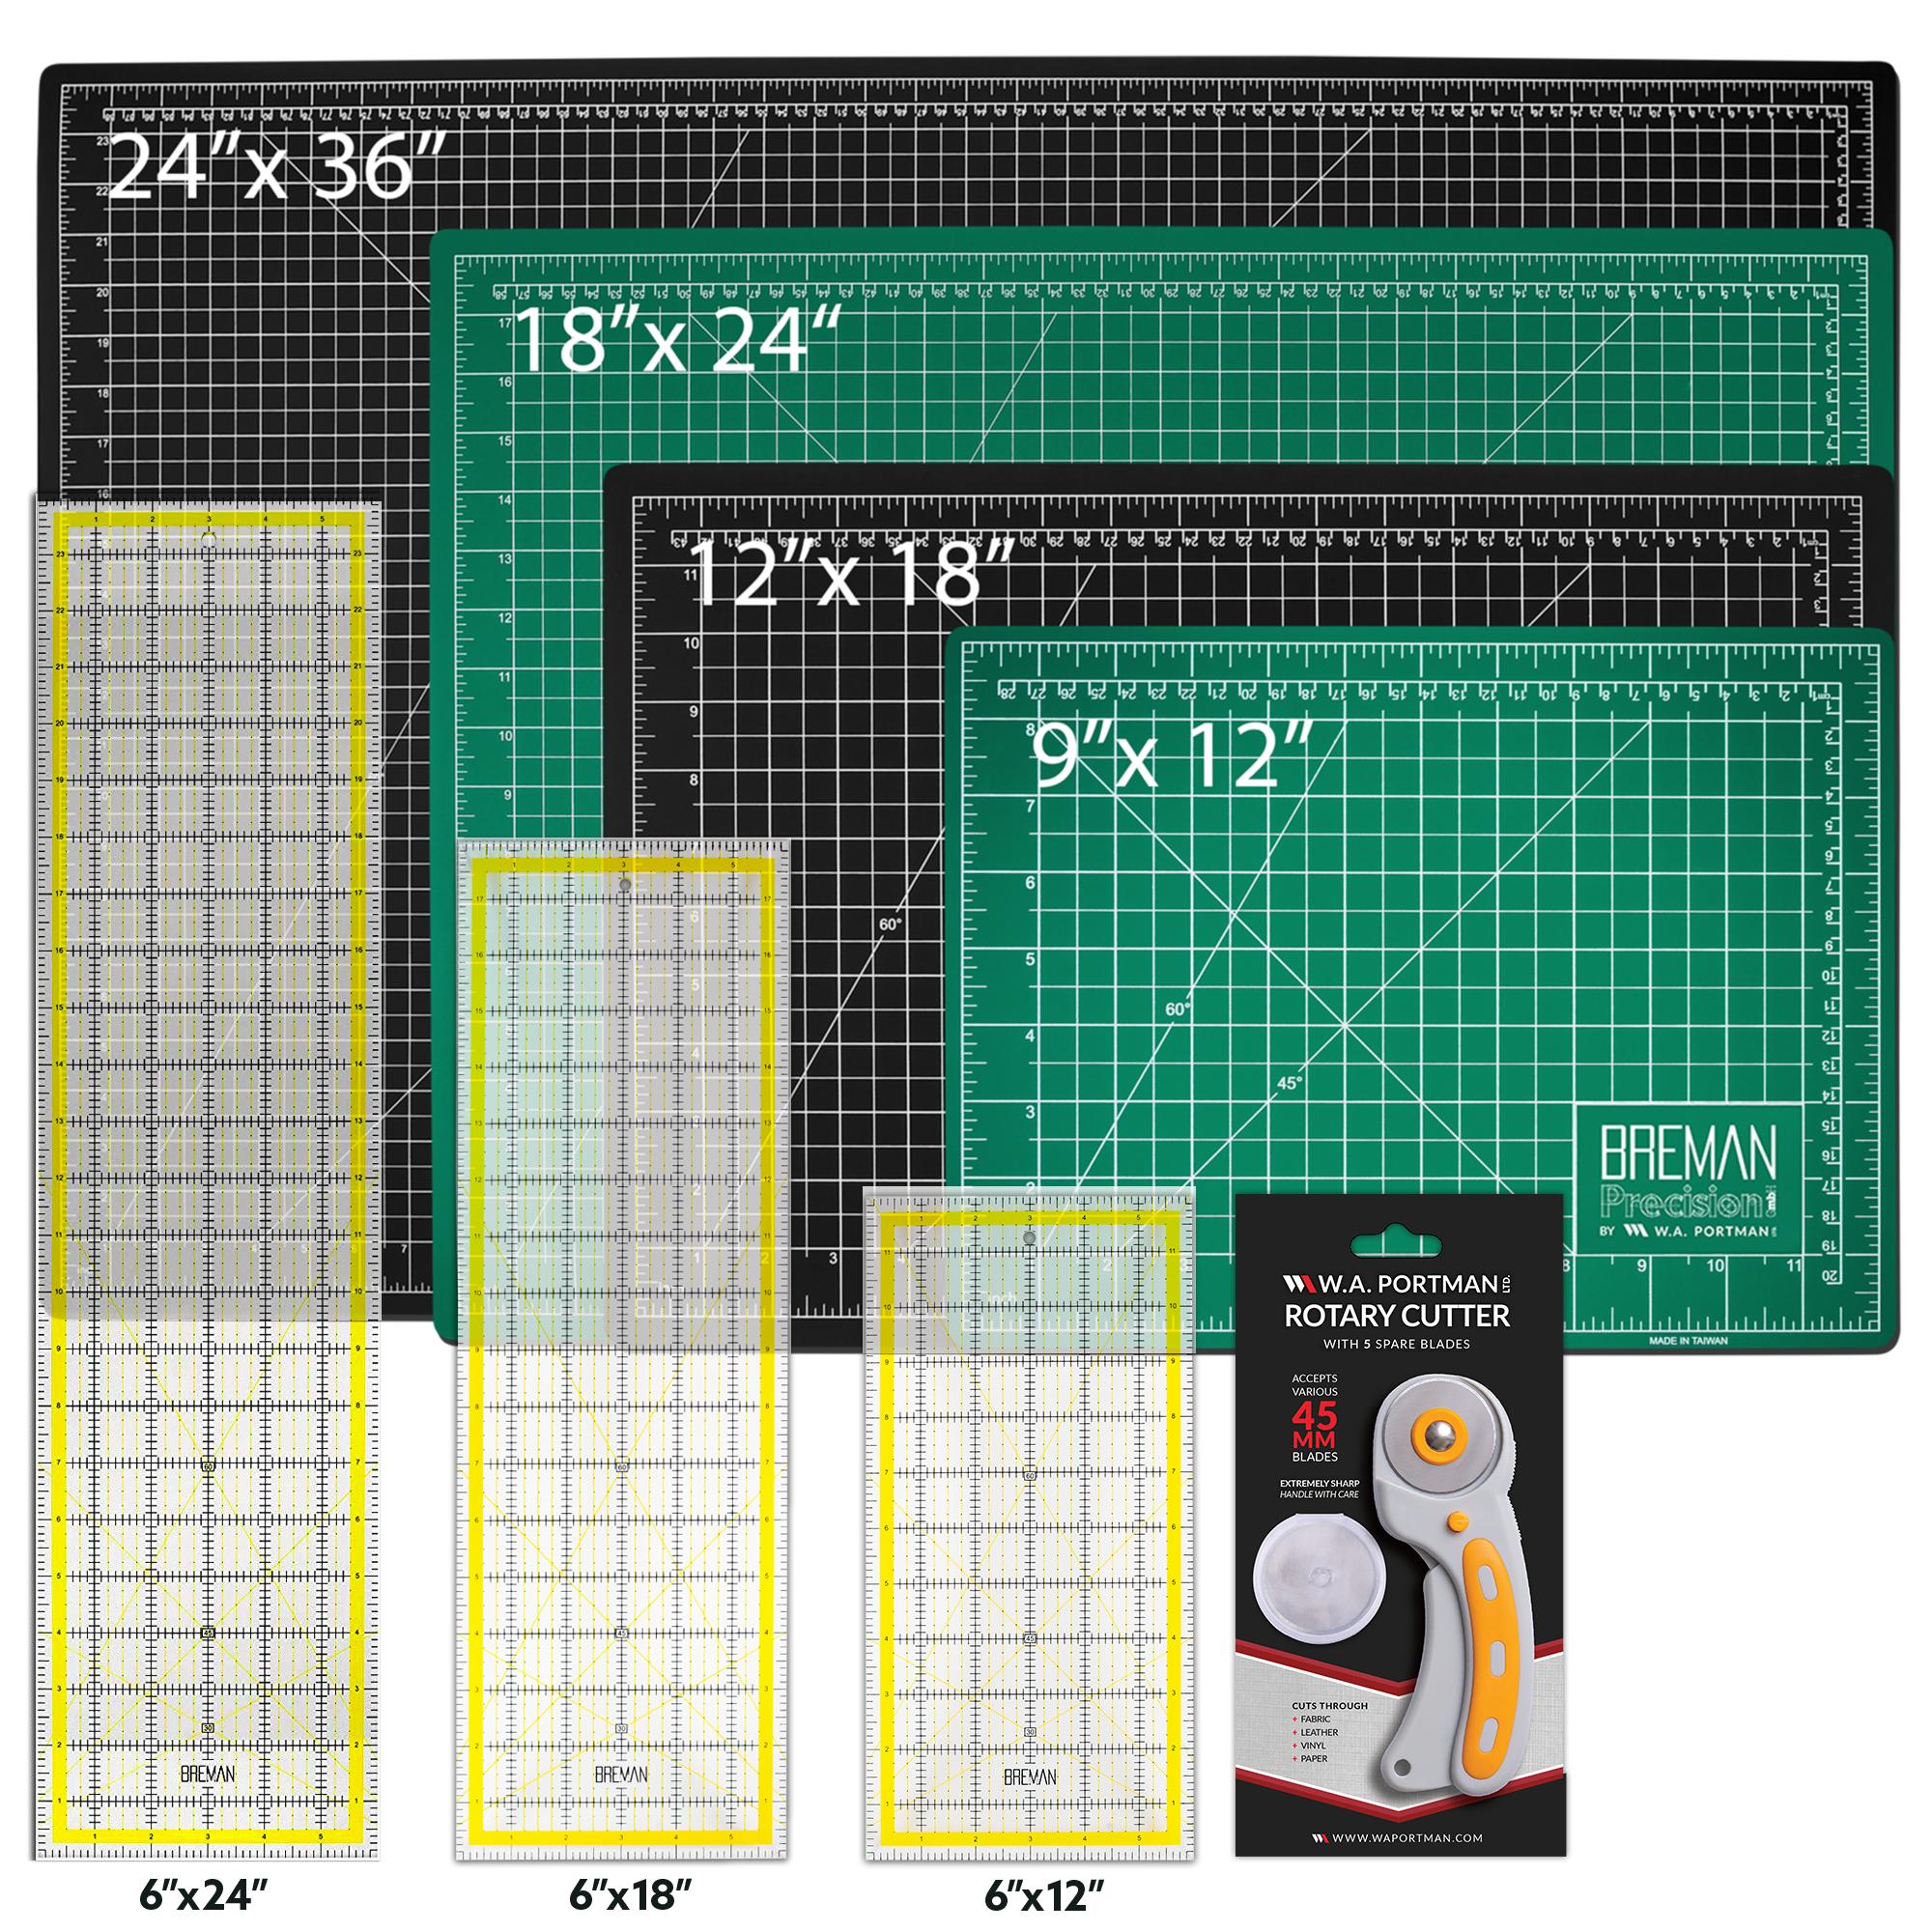 W.A. Portman Rotary Cutter Set w/ Quilting Ruler (9x12, 12x18, 18x24, 24x36)